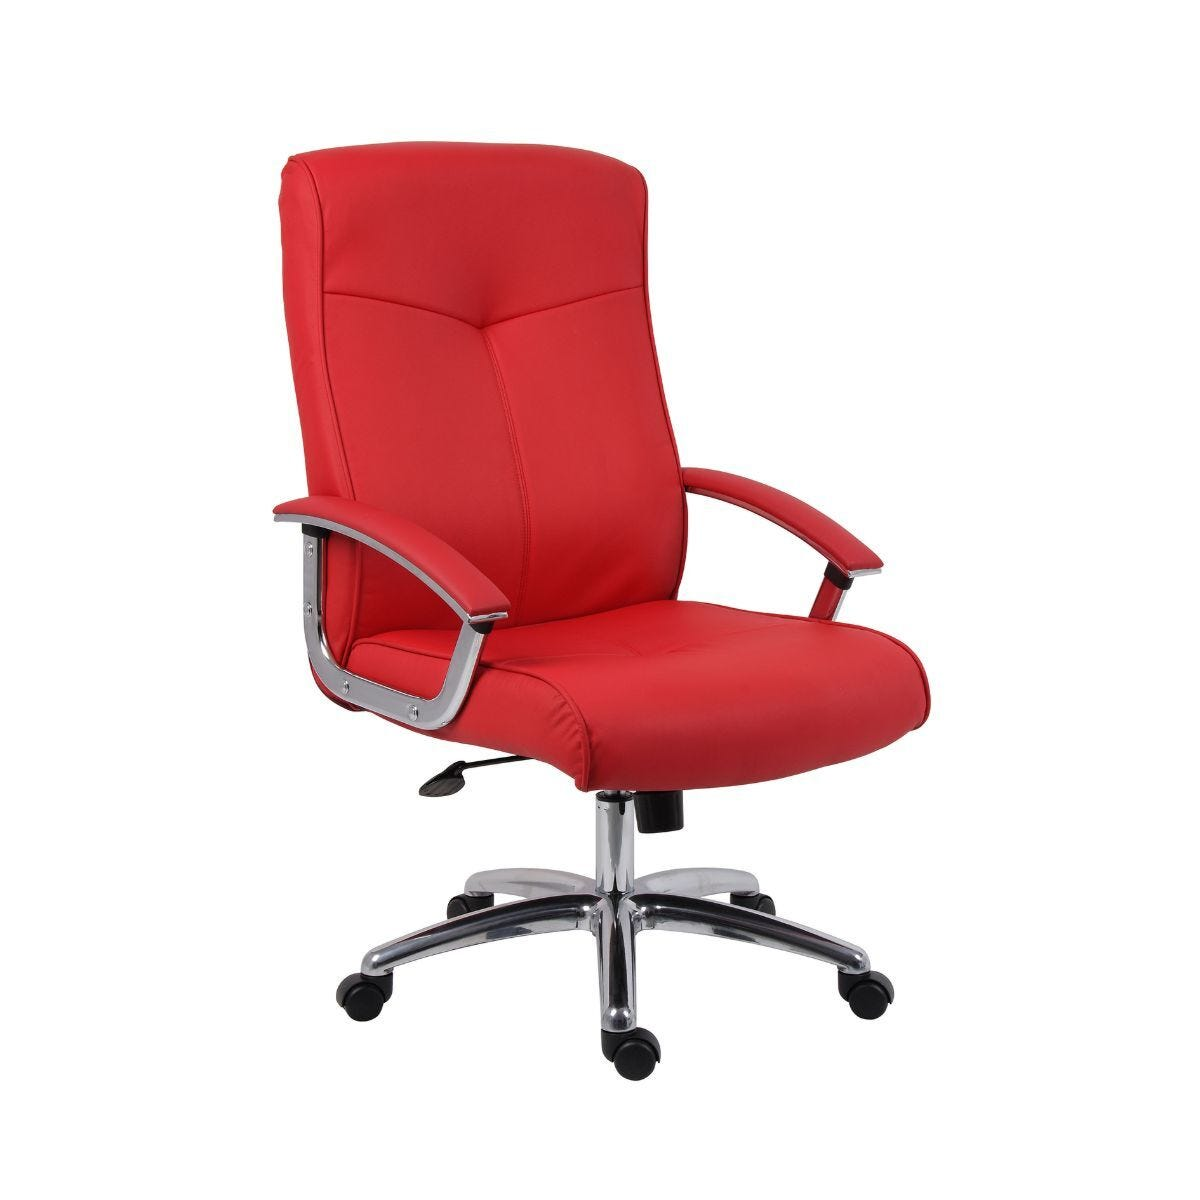 Teknik Office Hoxton Executive Chair